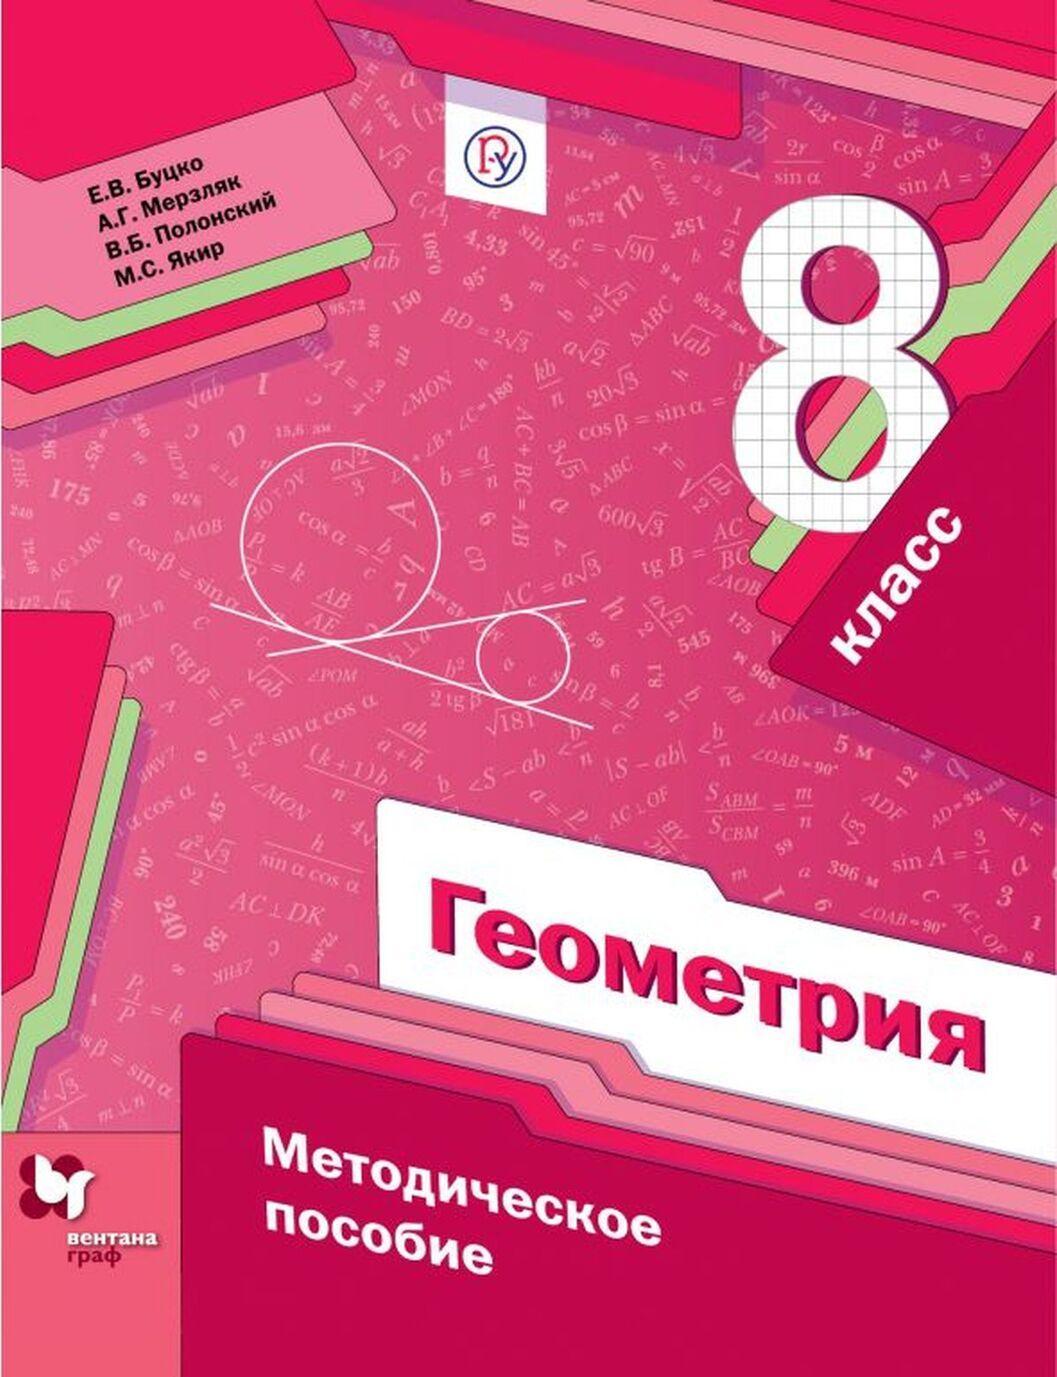 Geometrija. 8klass. Metodicheskoe posobie | Butsko Elena Vladimirovna, Jakir Mikhail Semenovich